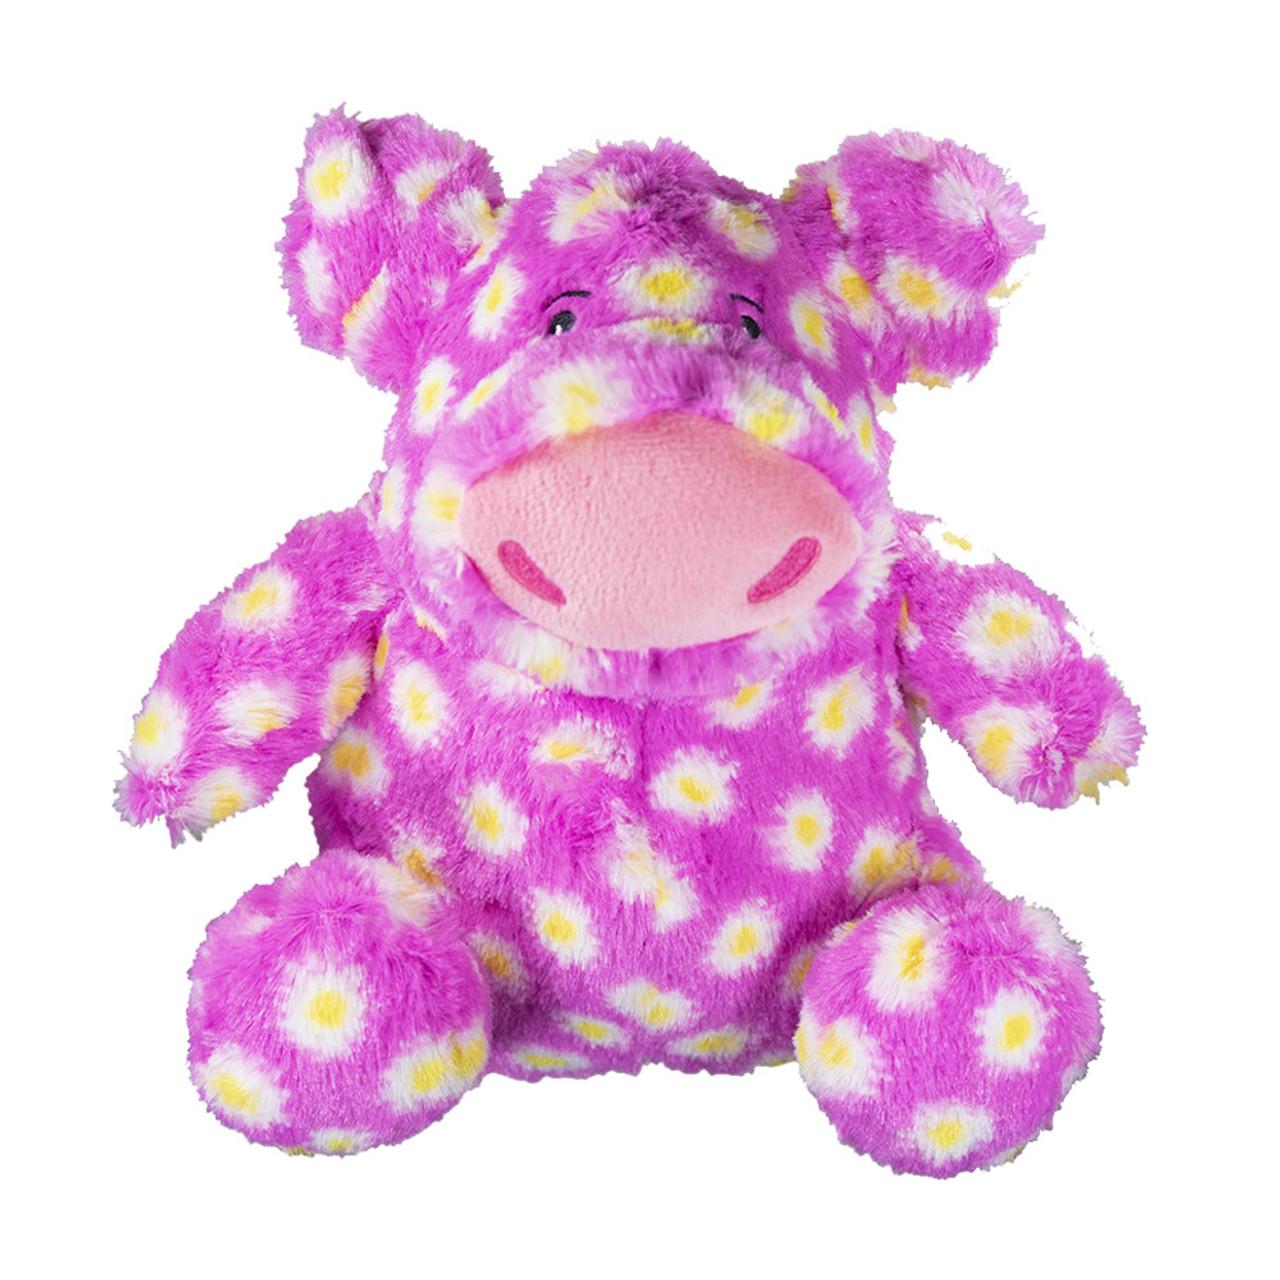 Hero Chuckles Pig Plush Dog Toy